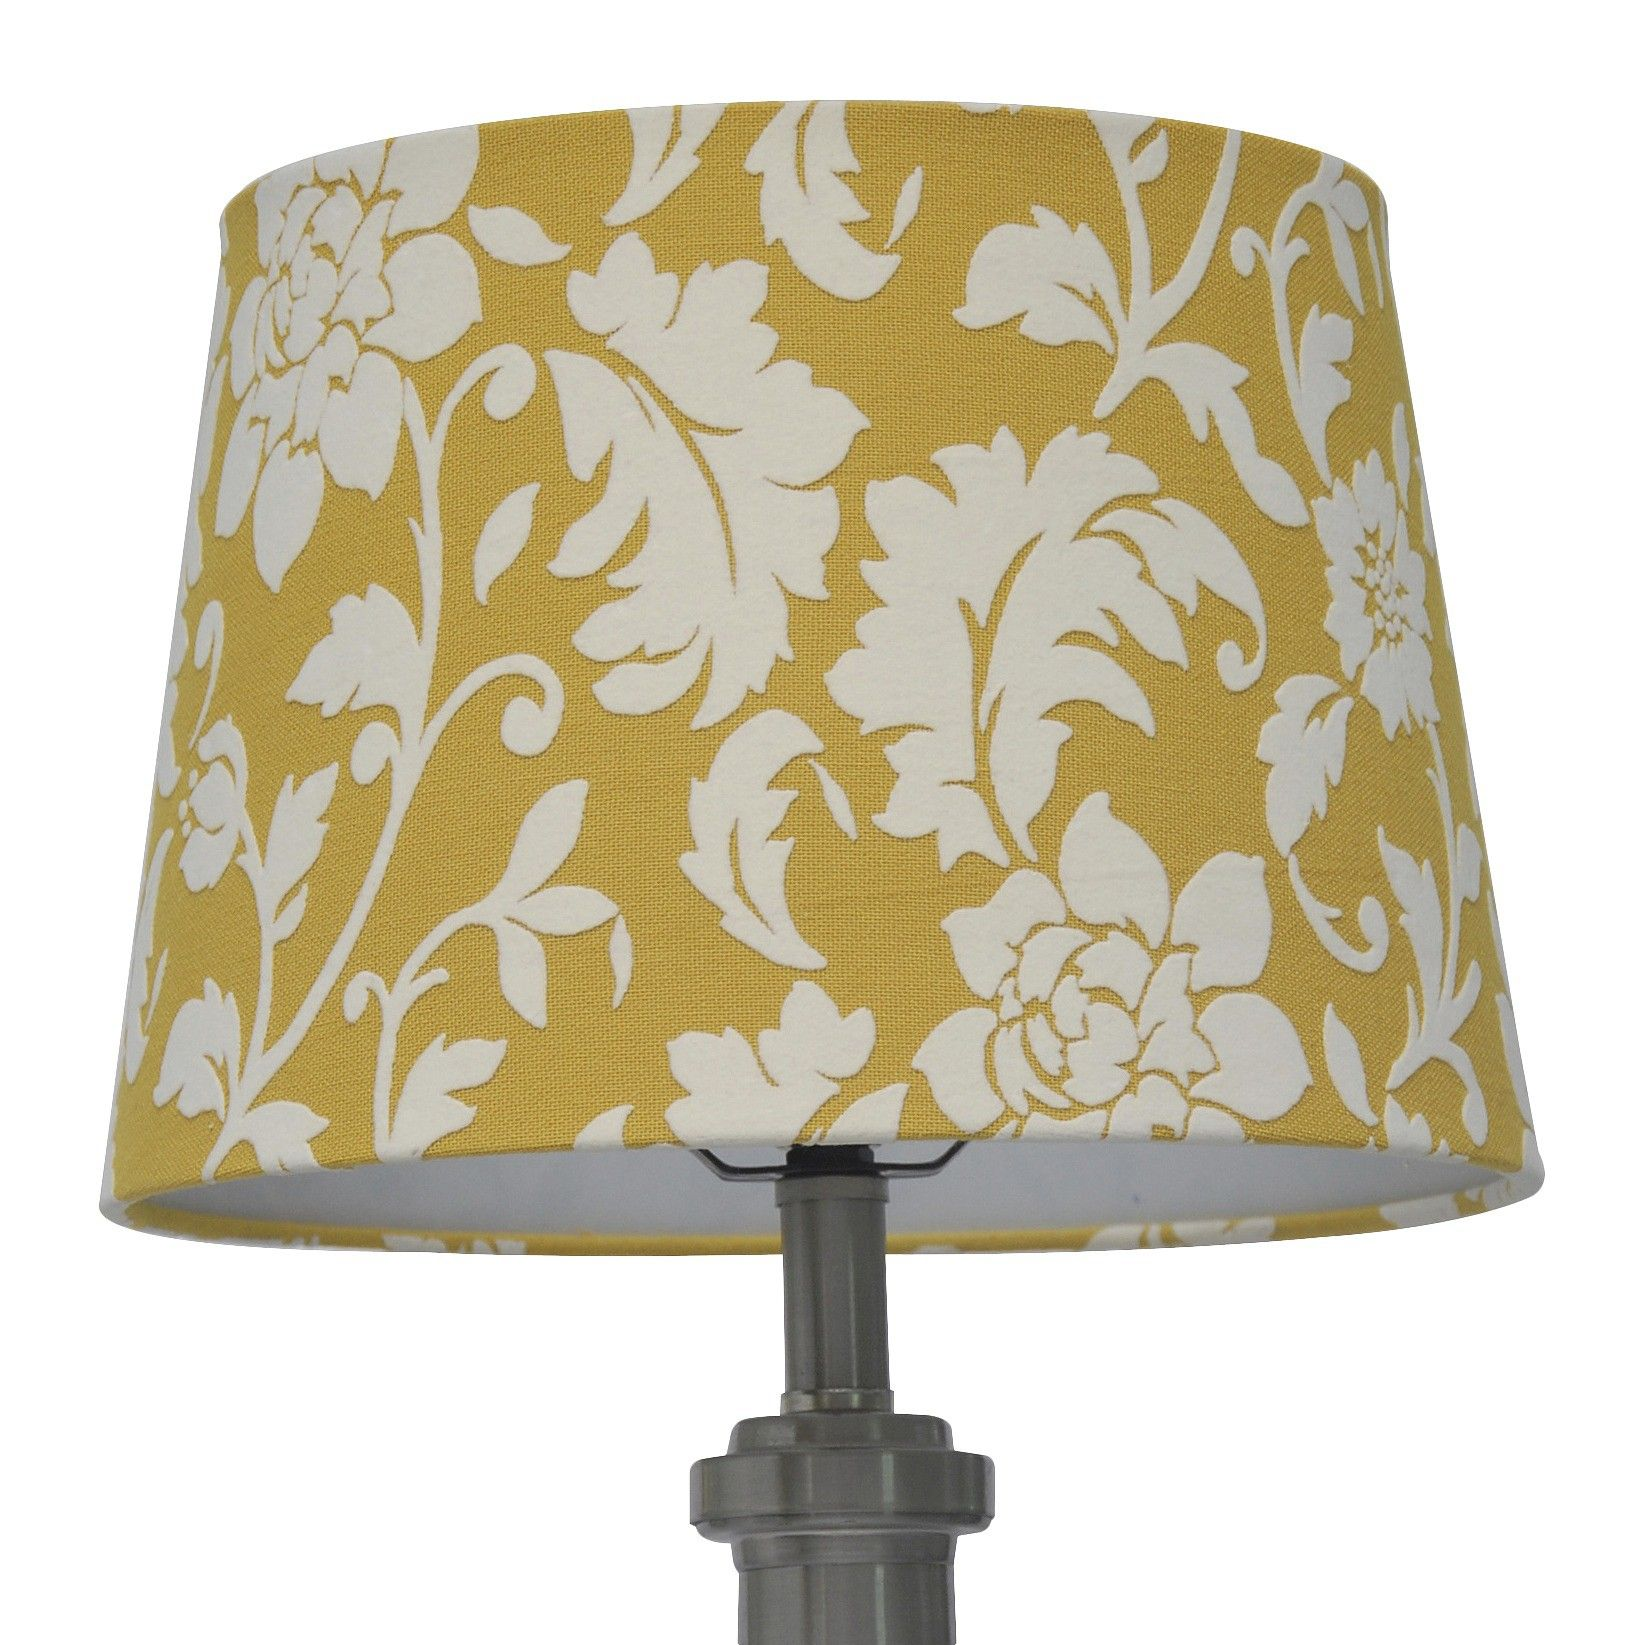 Threshold Flocked Damask Lamp Shade Large Summer Wheat Lamp Lamp Shade Shades